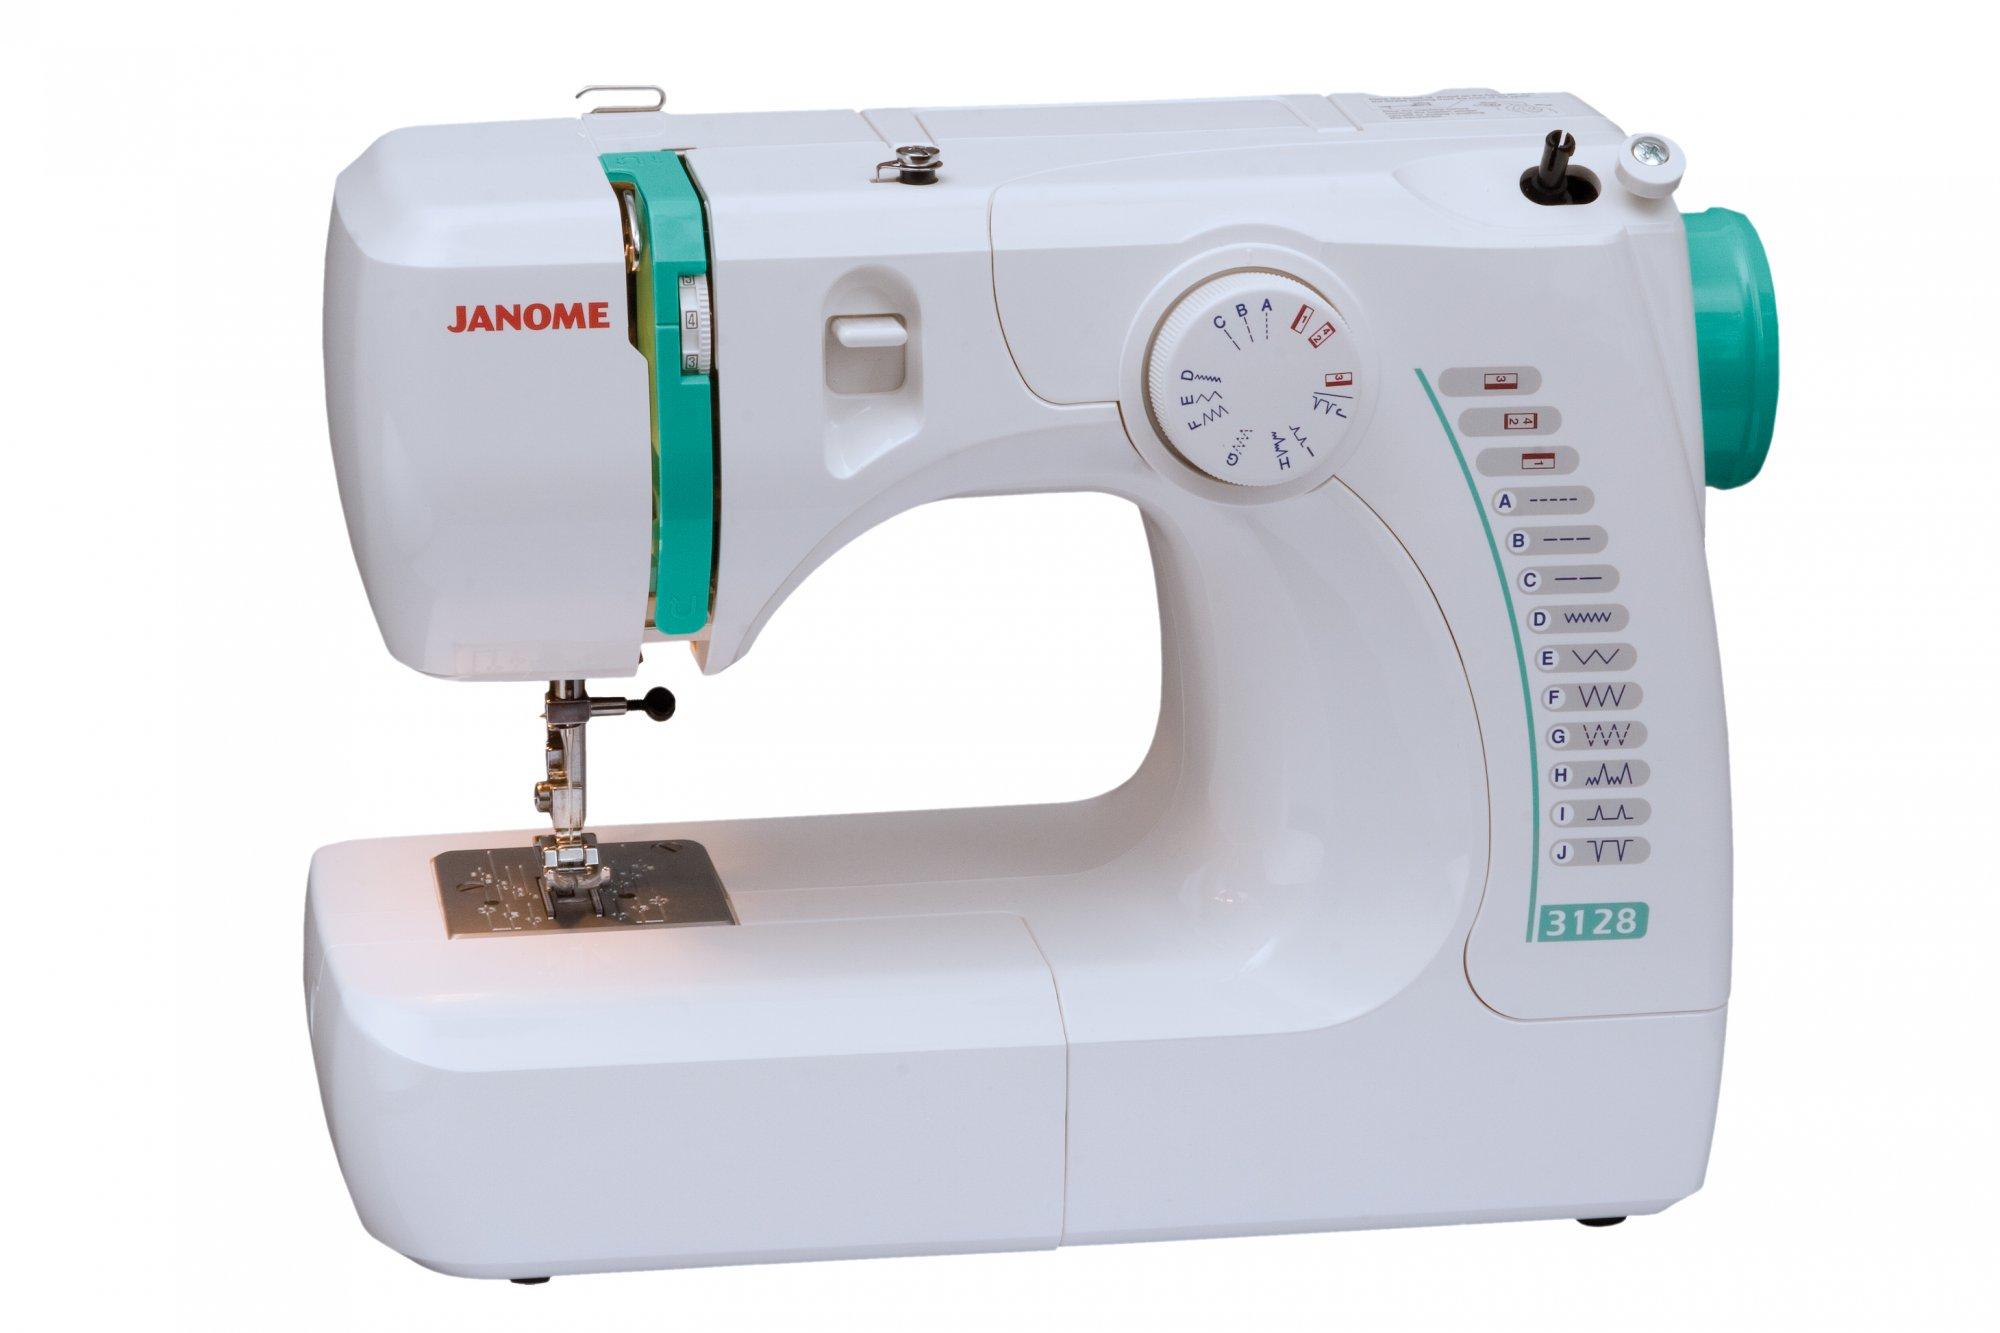 Janome 3128